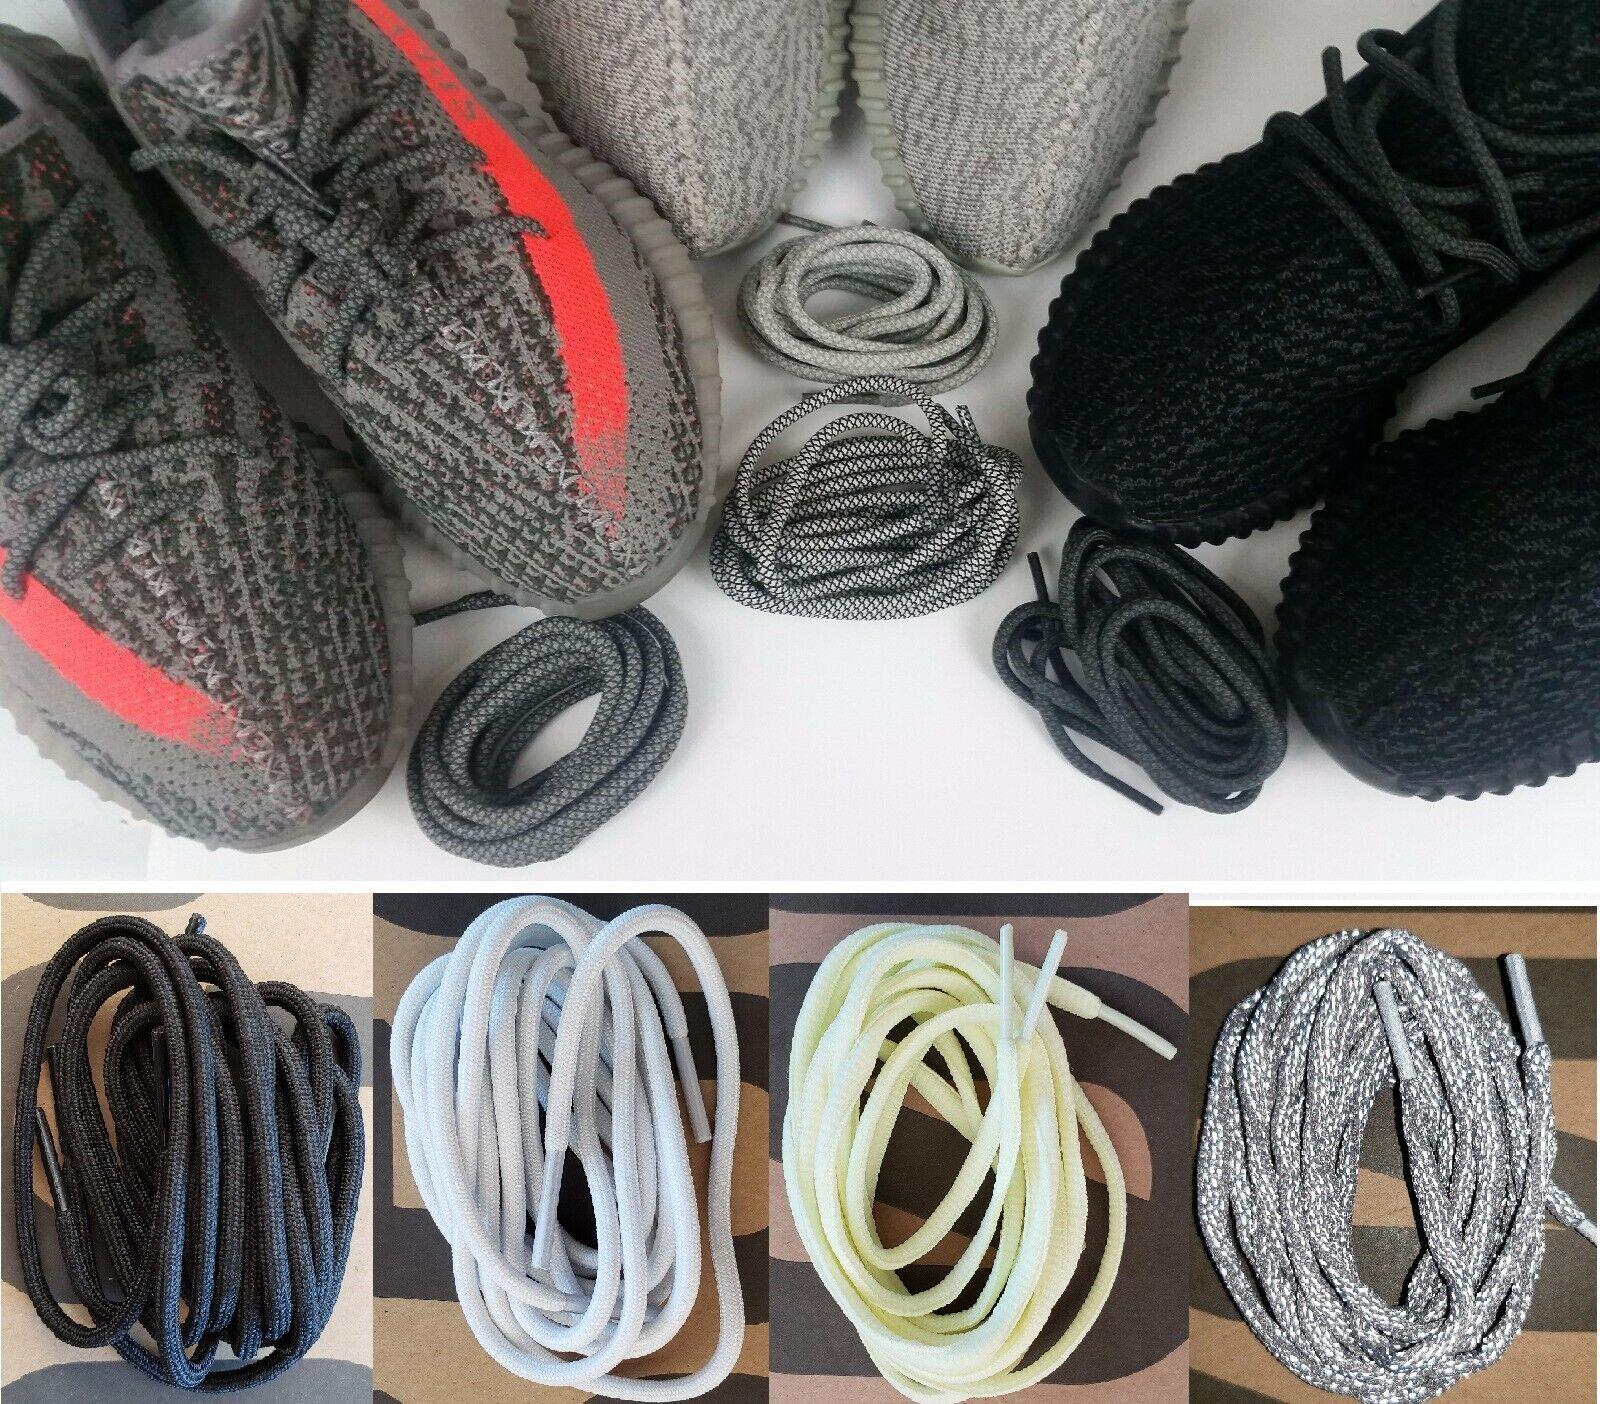 White Black Skull /& Crossbones Pirate Shoelaces Lases Laces Flirt New Shoe